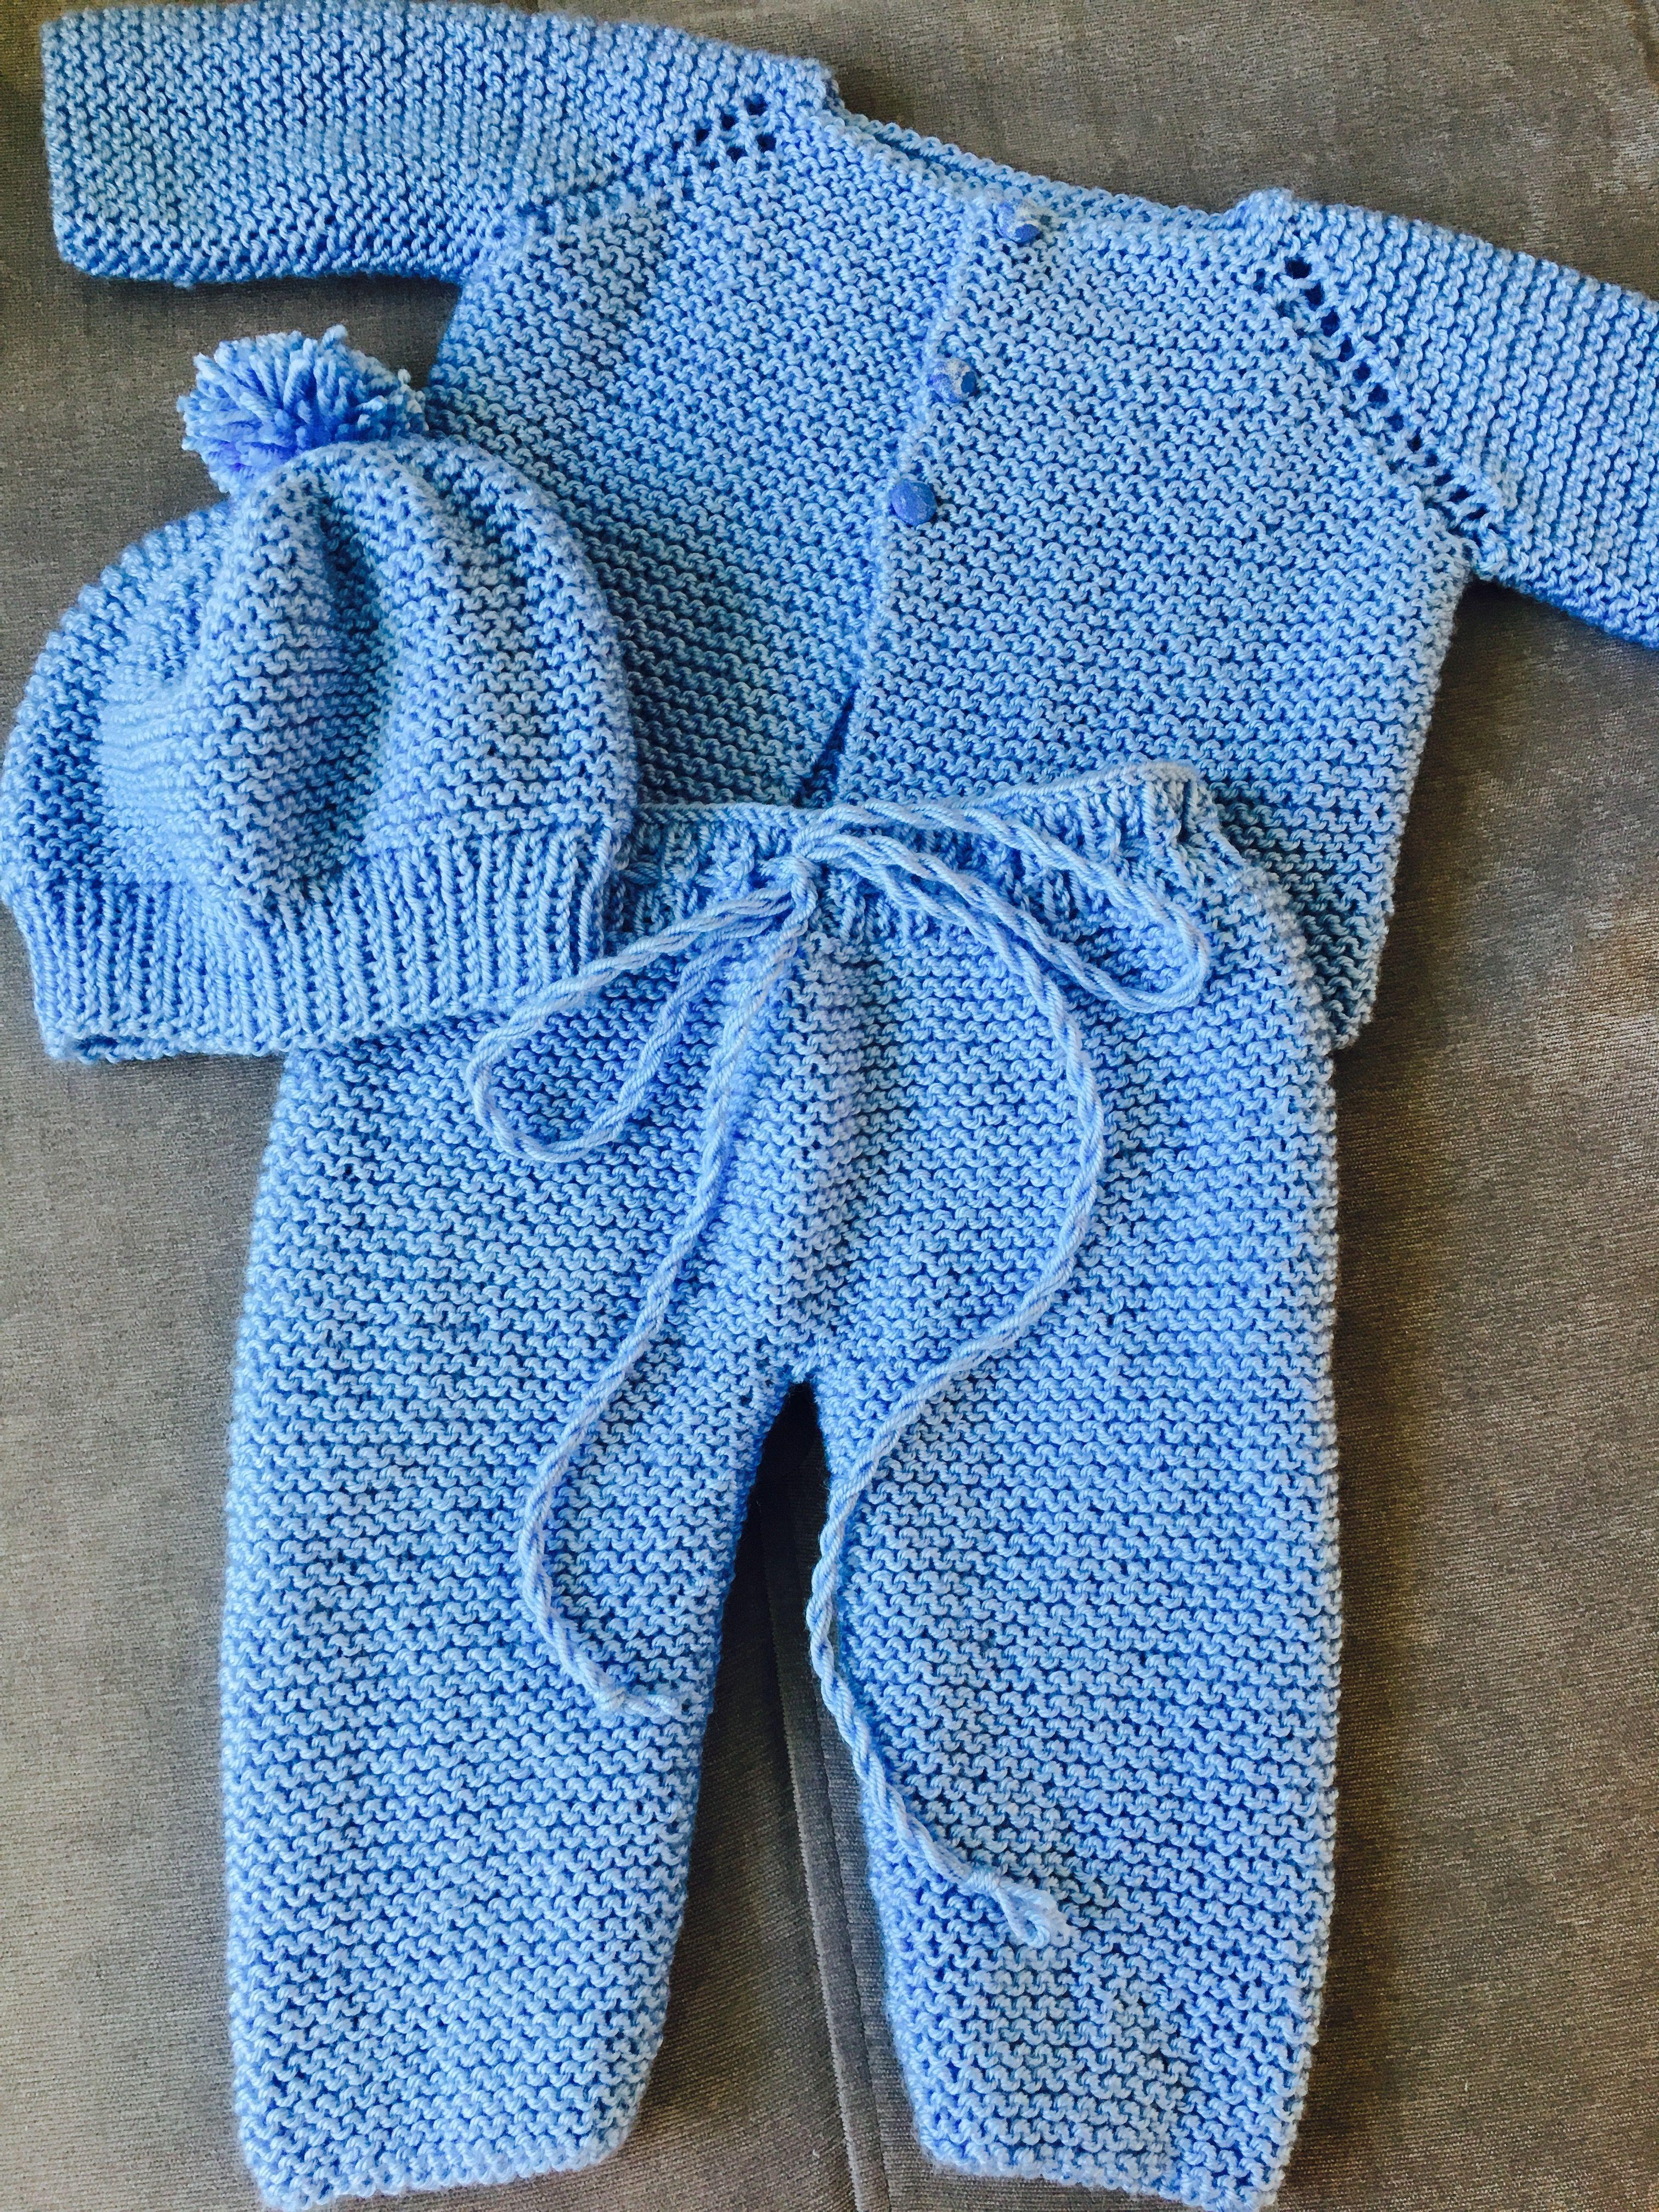 Pin by Elizabethduarte on Bebe | Pinterest | Babies, Crochet and ...